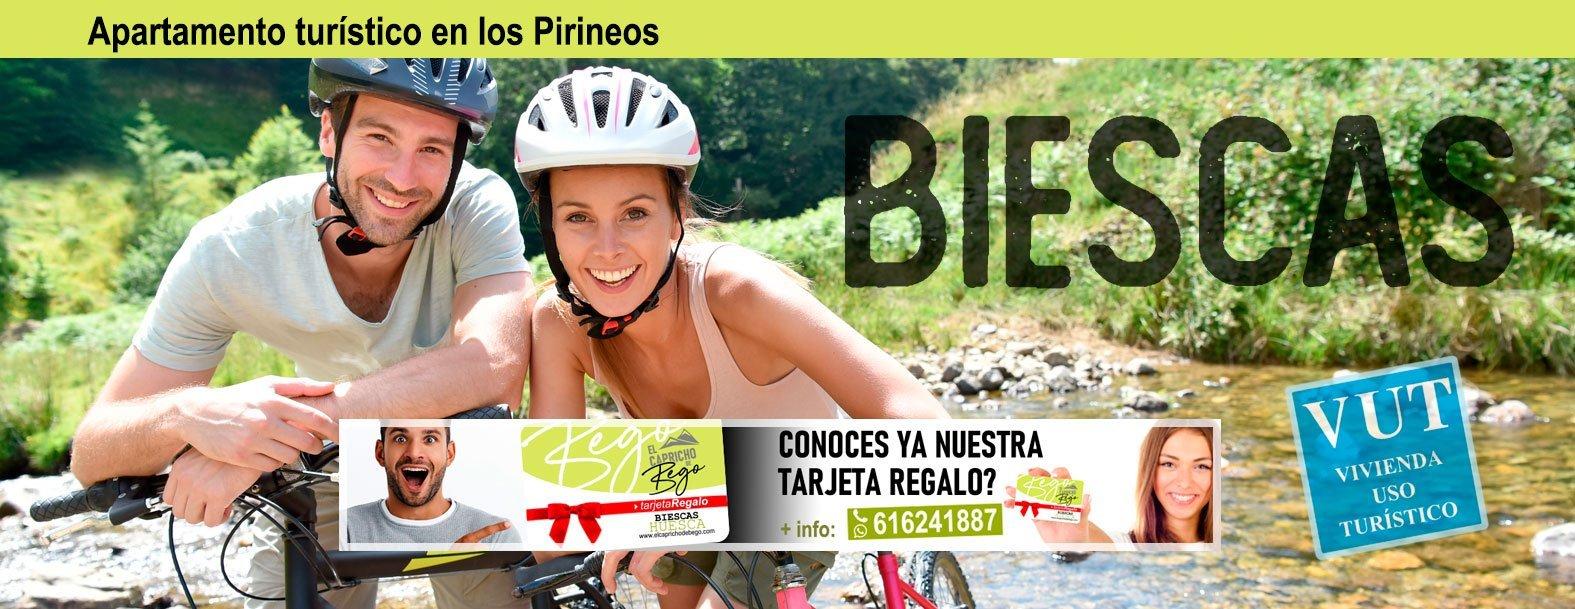 Cicloturismo-BIESCAS-Capricho-de-Bego